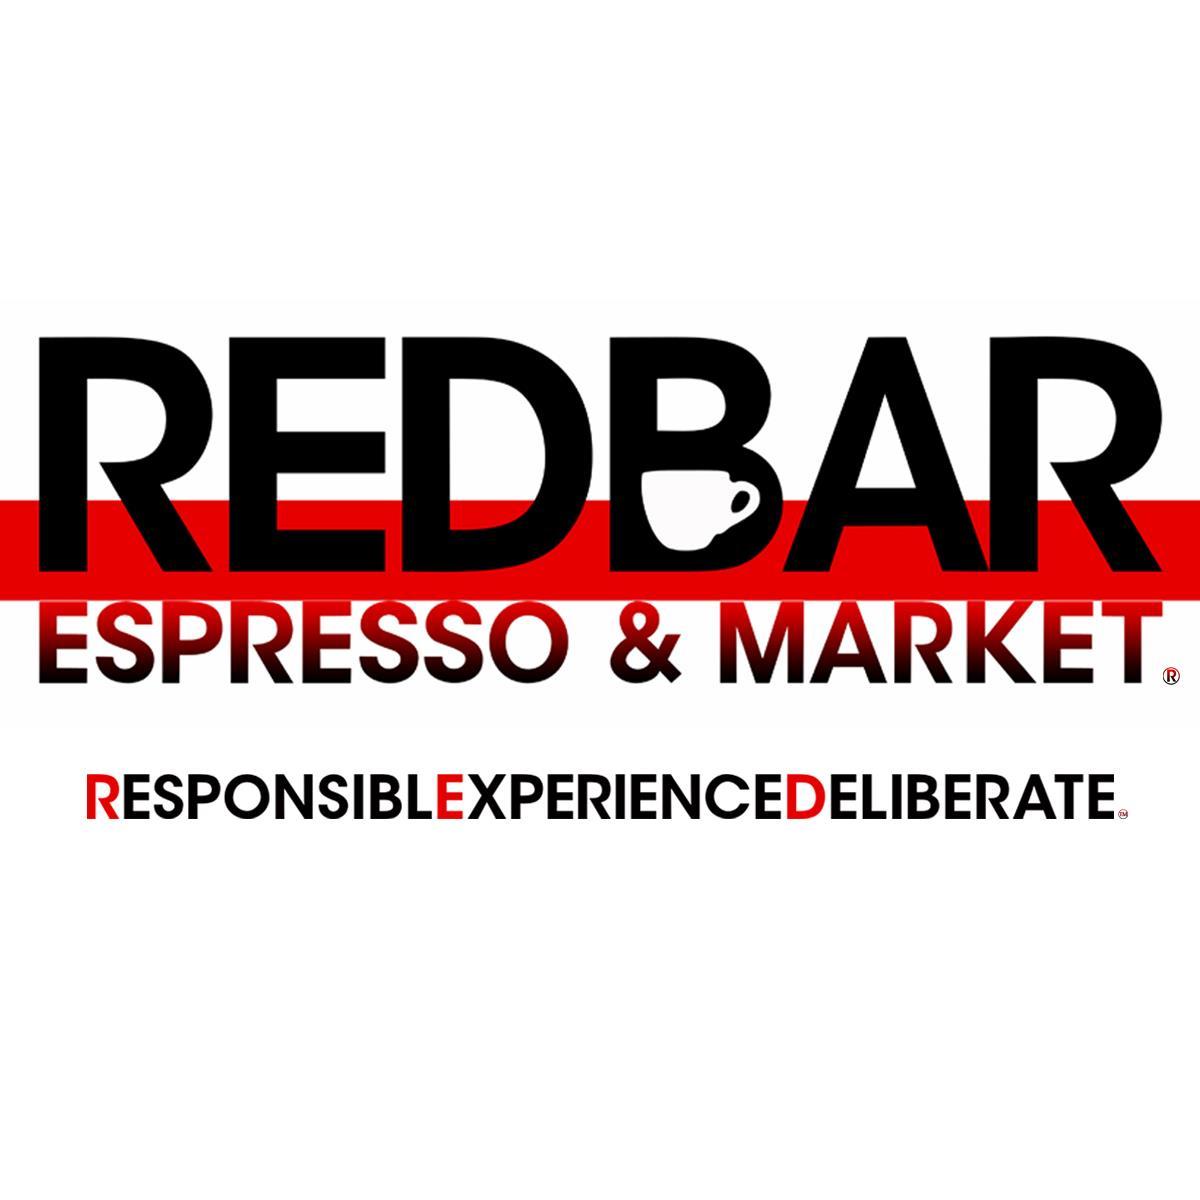 REDBAR Espresso & Market LLC